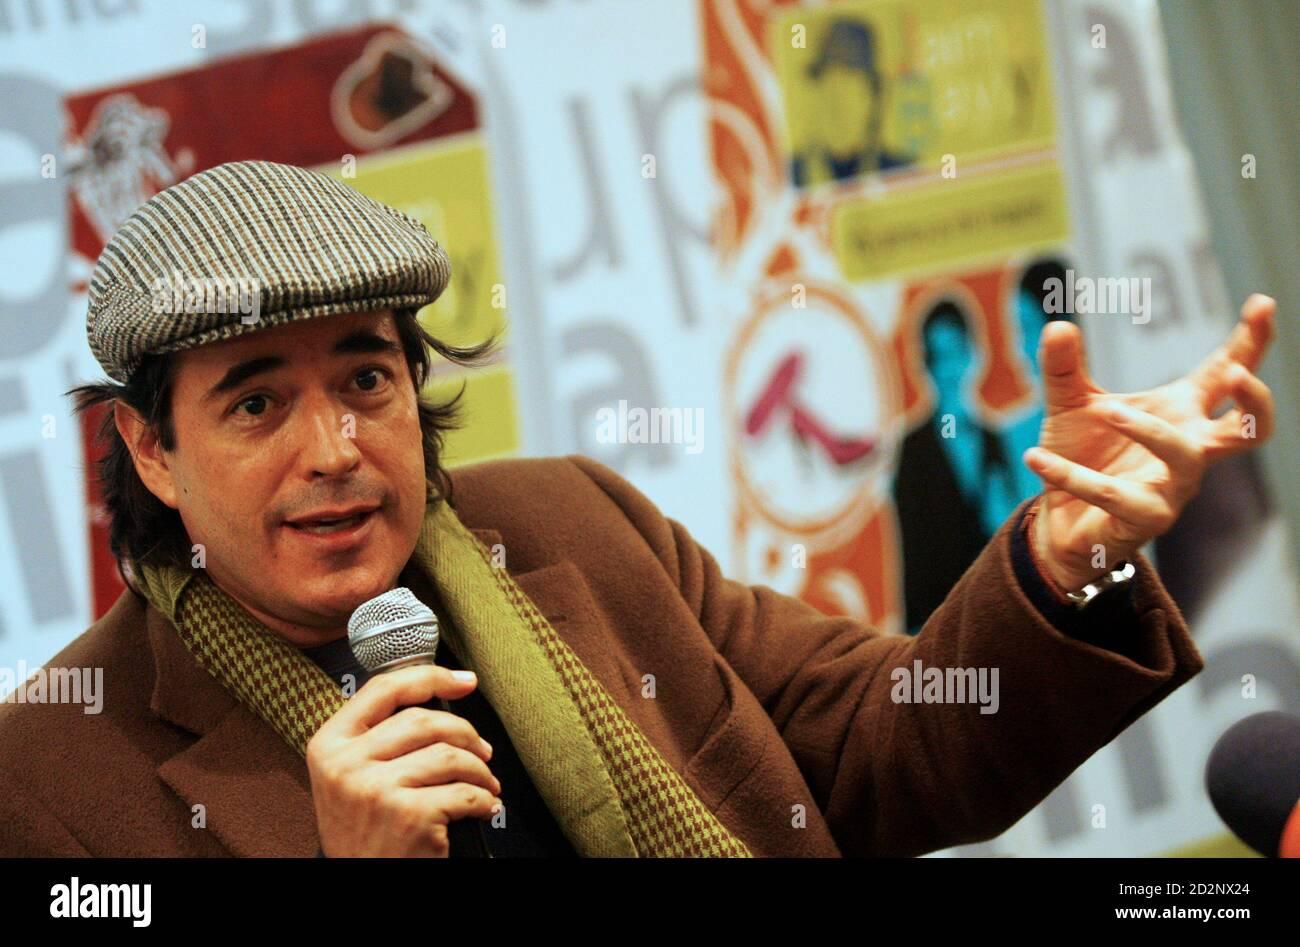 Peruvian Novelist And Tv Talkshow Host Jaime Bayly Speaks During A News Conference In Lima S Country La credibilidad está por encima, confesó la vidente favorita de jaime bayly. alamy